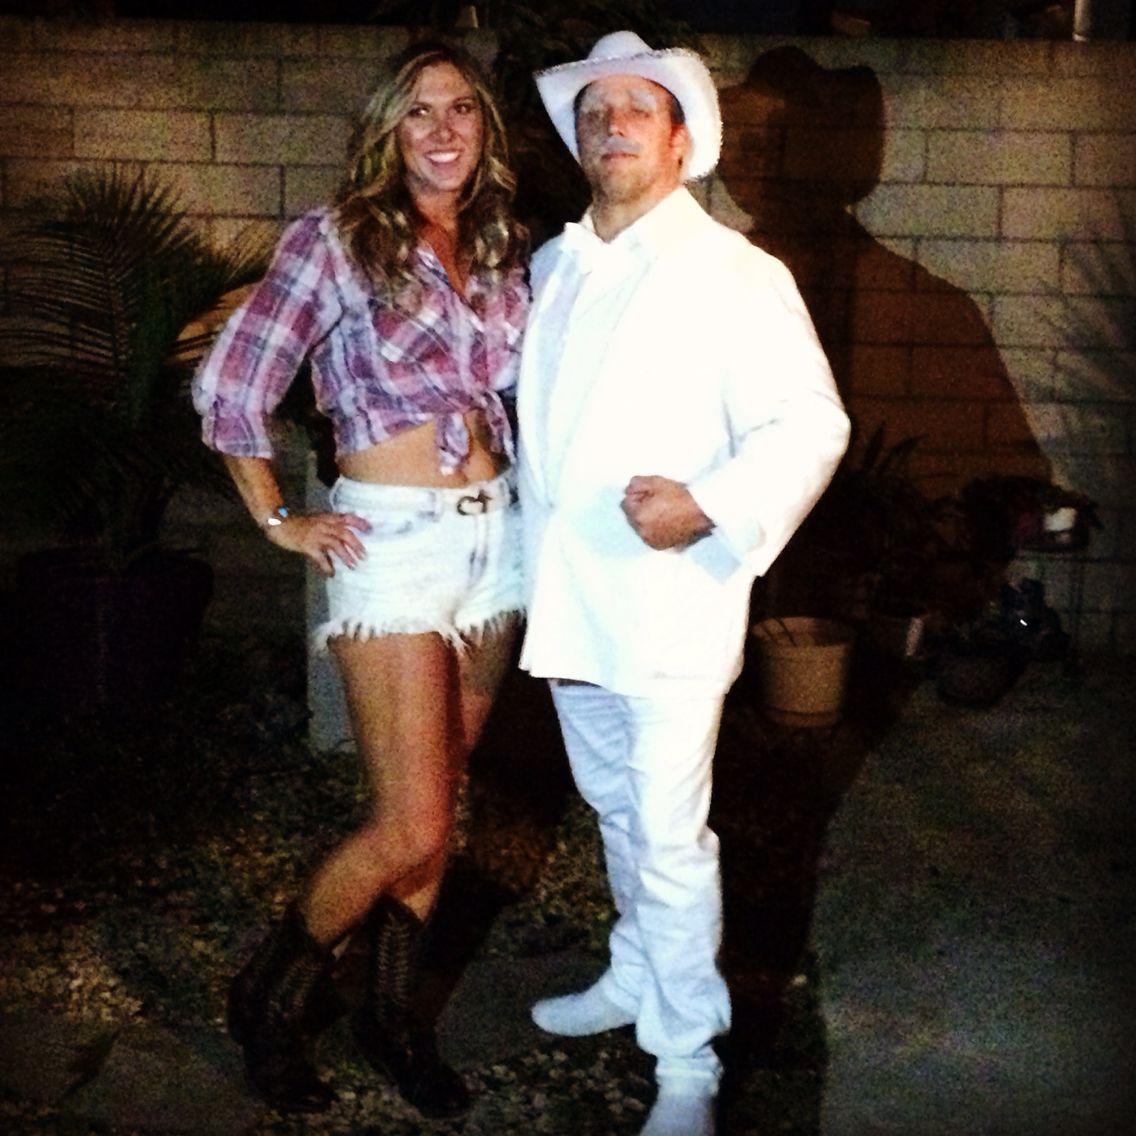 diy halloween costume boss hogg daisy duke dukesofhazzard diyhaloweencostume bosshogg - Daisy Dukes Halloween Costume